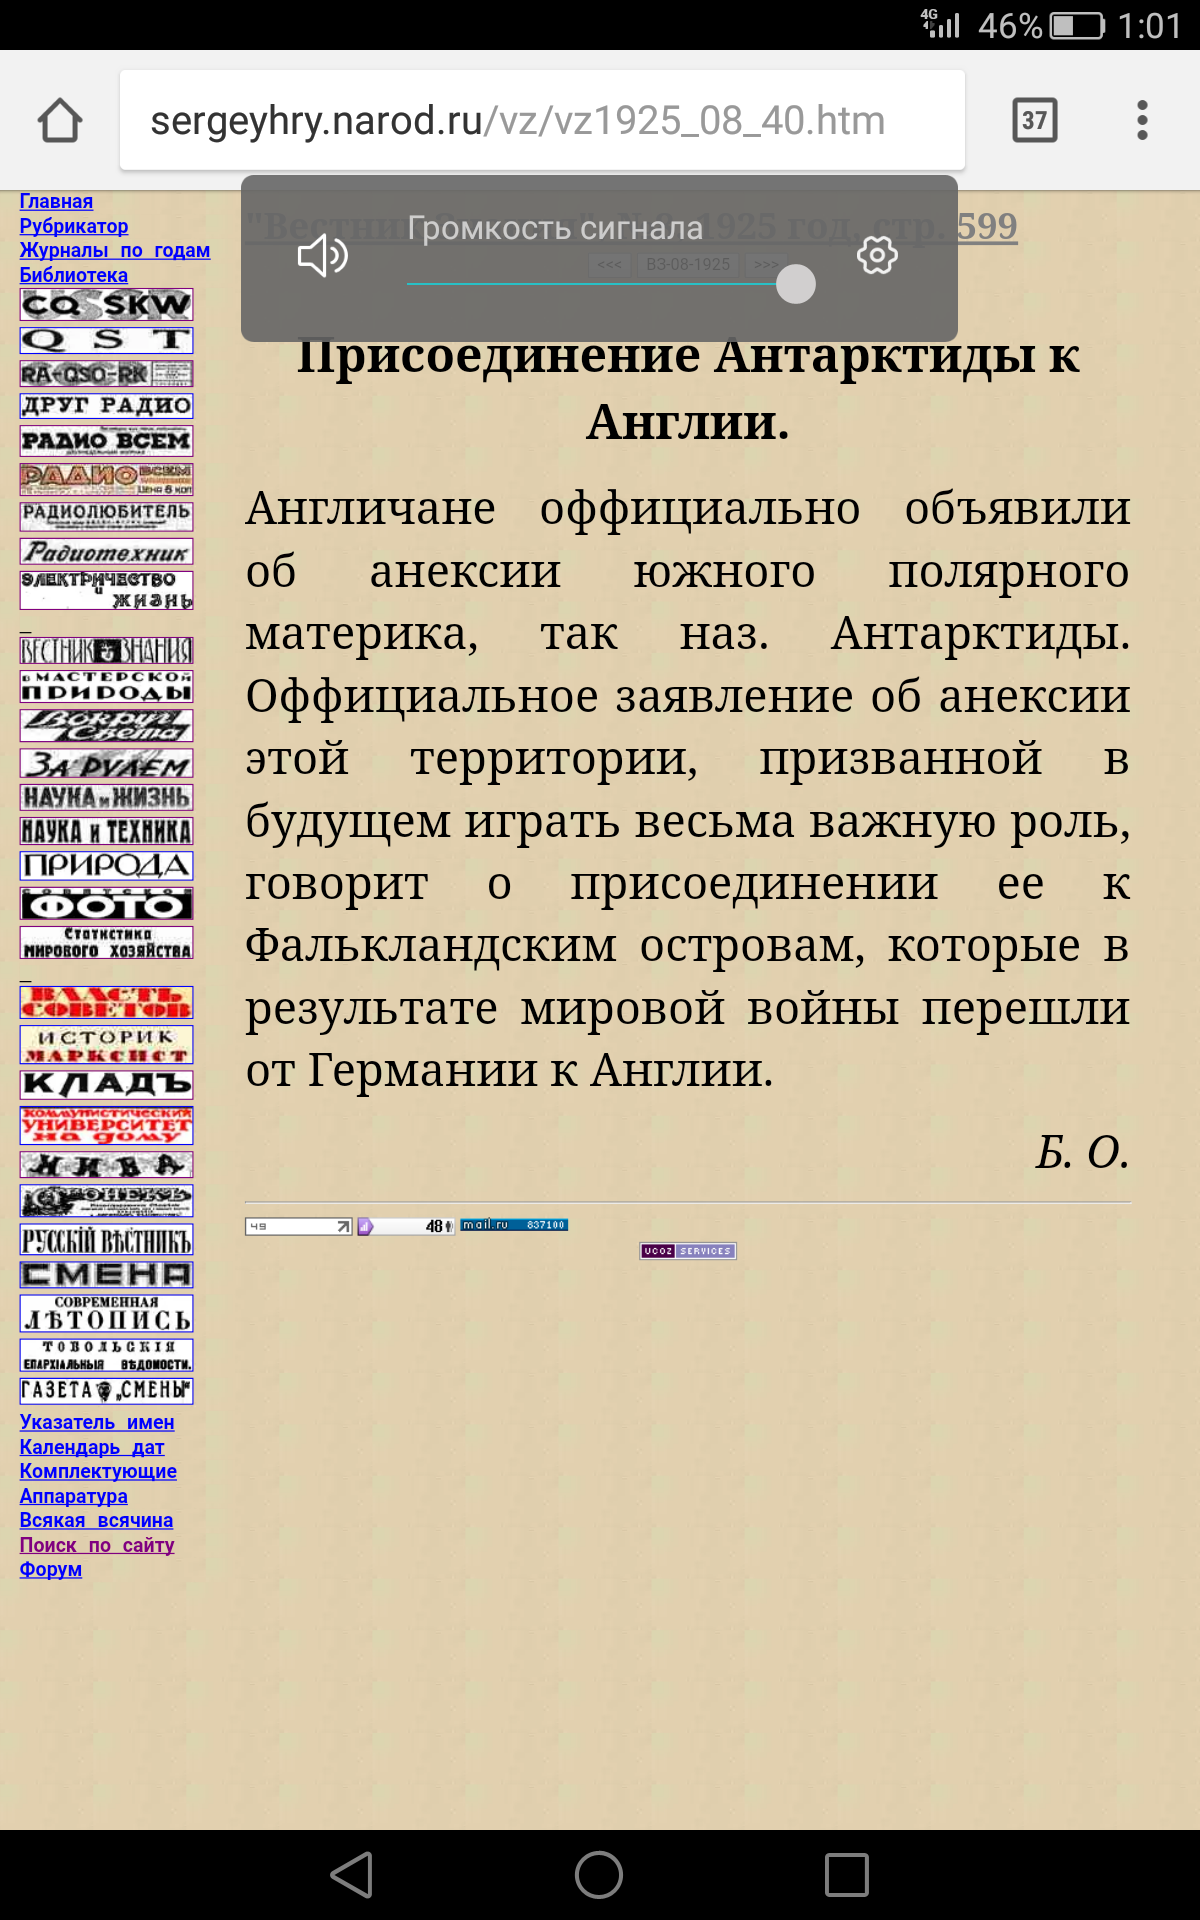 Screenshot_2018-01-02-01-01-09.png